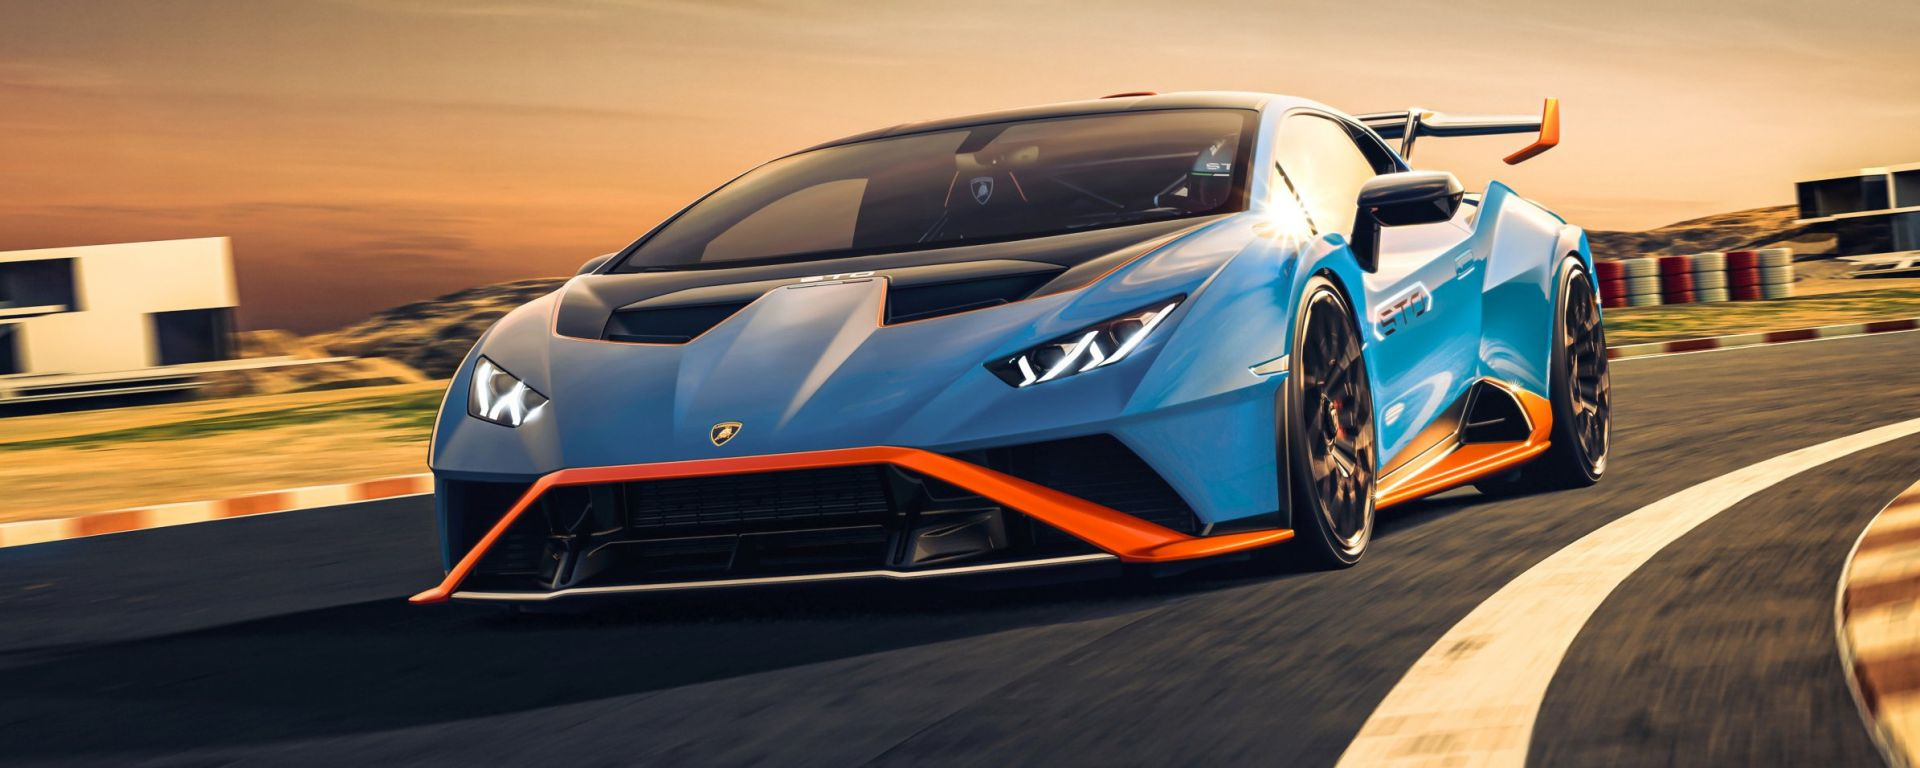 Lamborghini Huracan STO: la nuova supercar di Sant'Agata Bolognese